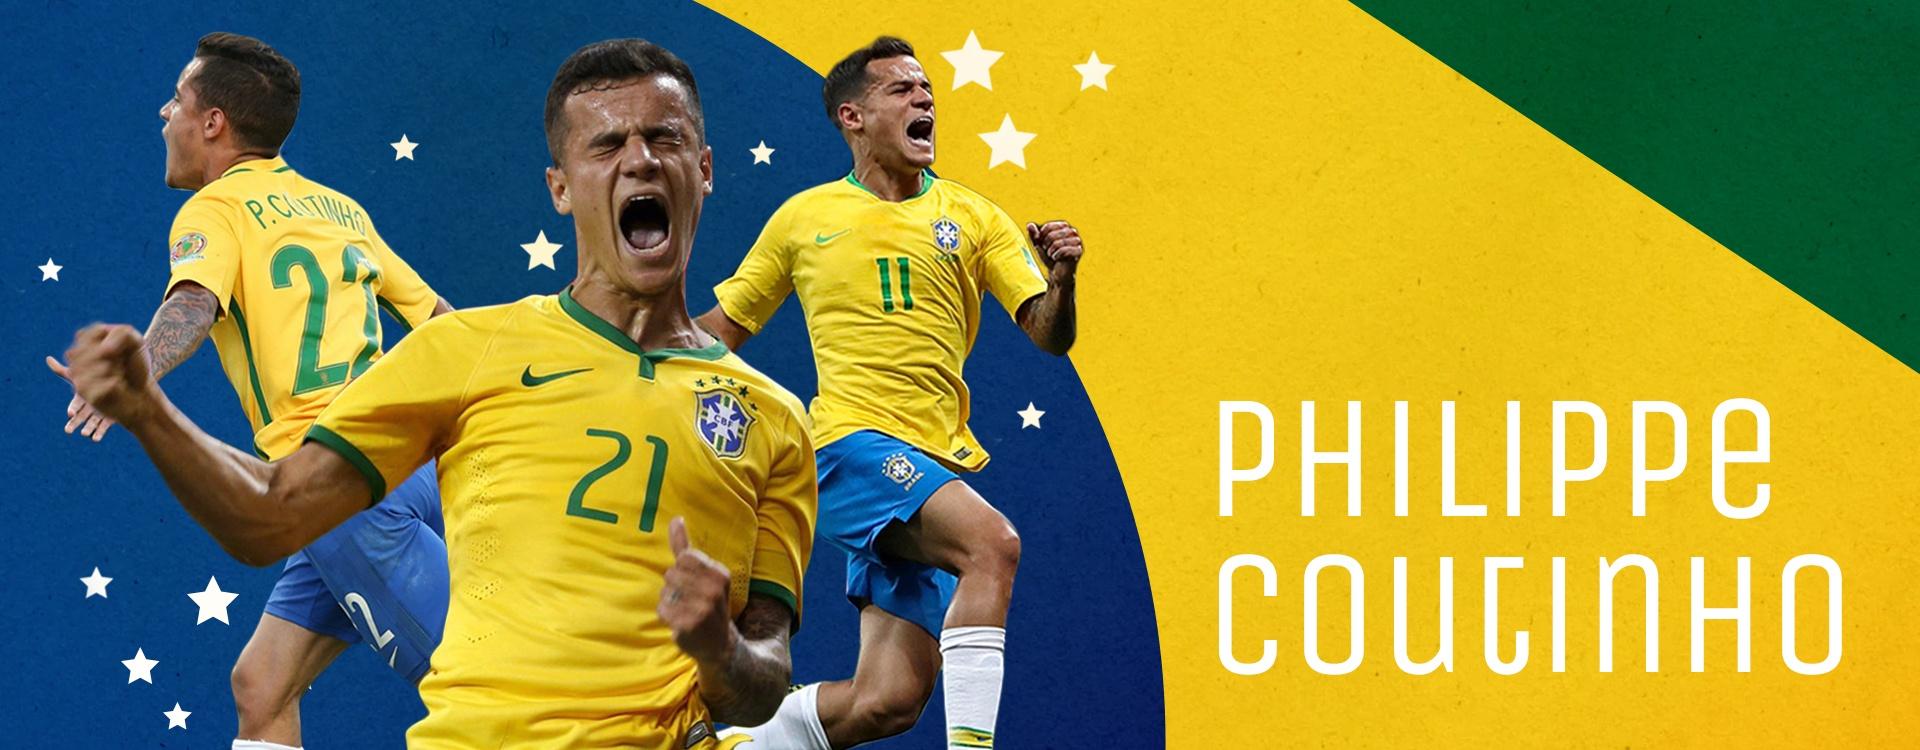 Philippe Coutinho: Cho dua so 1 cua tuyen Brazil hinh anh 13